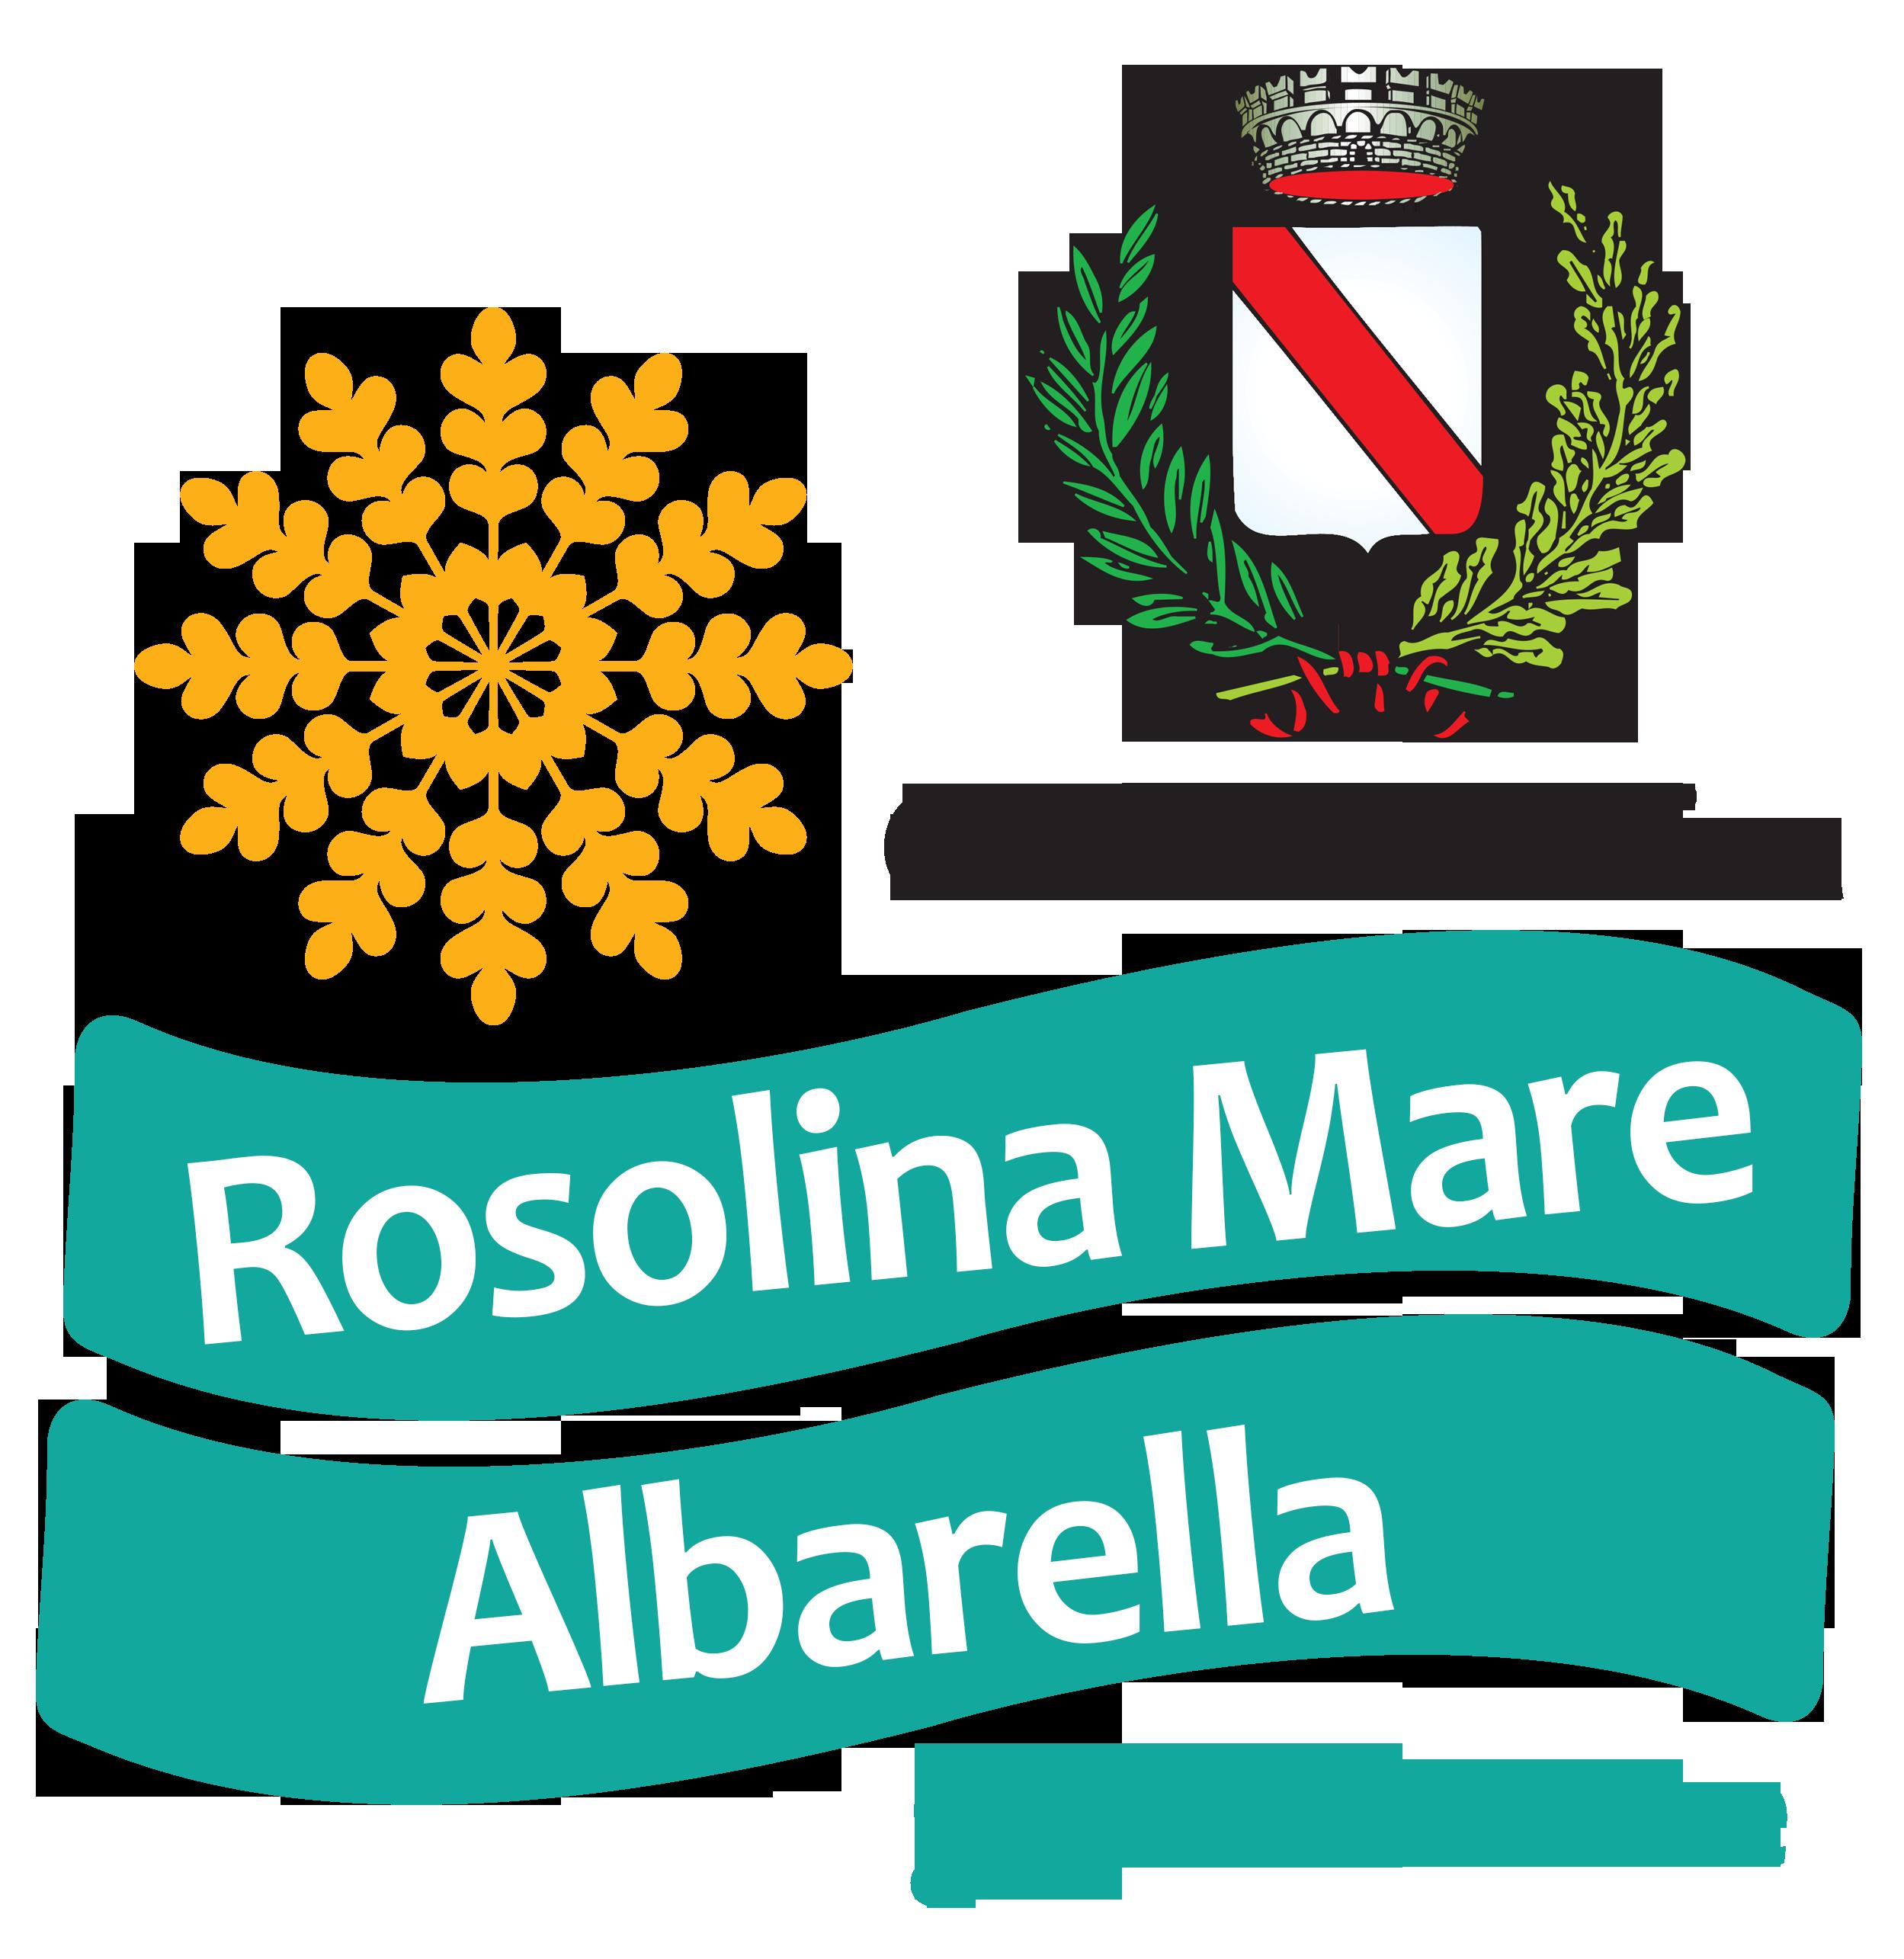 Rosolina